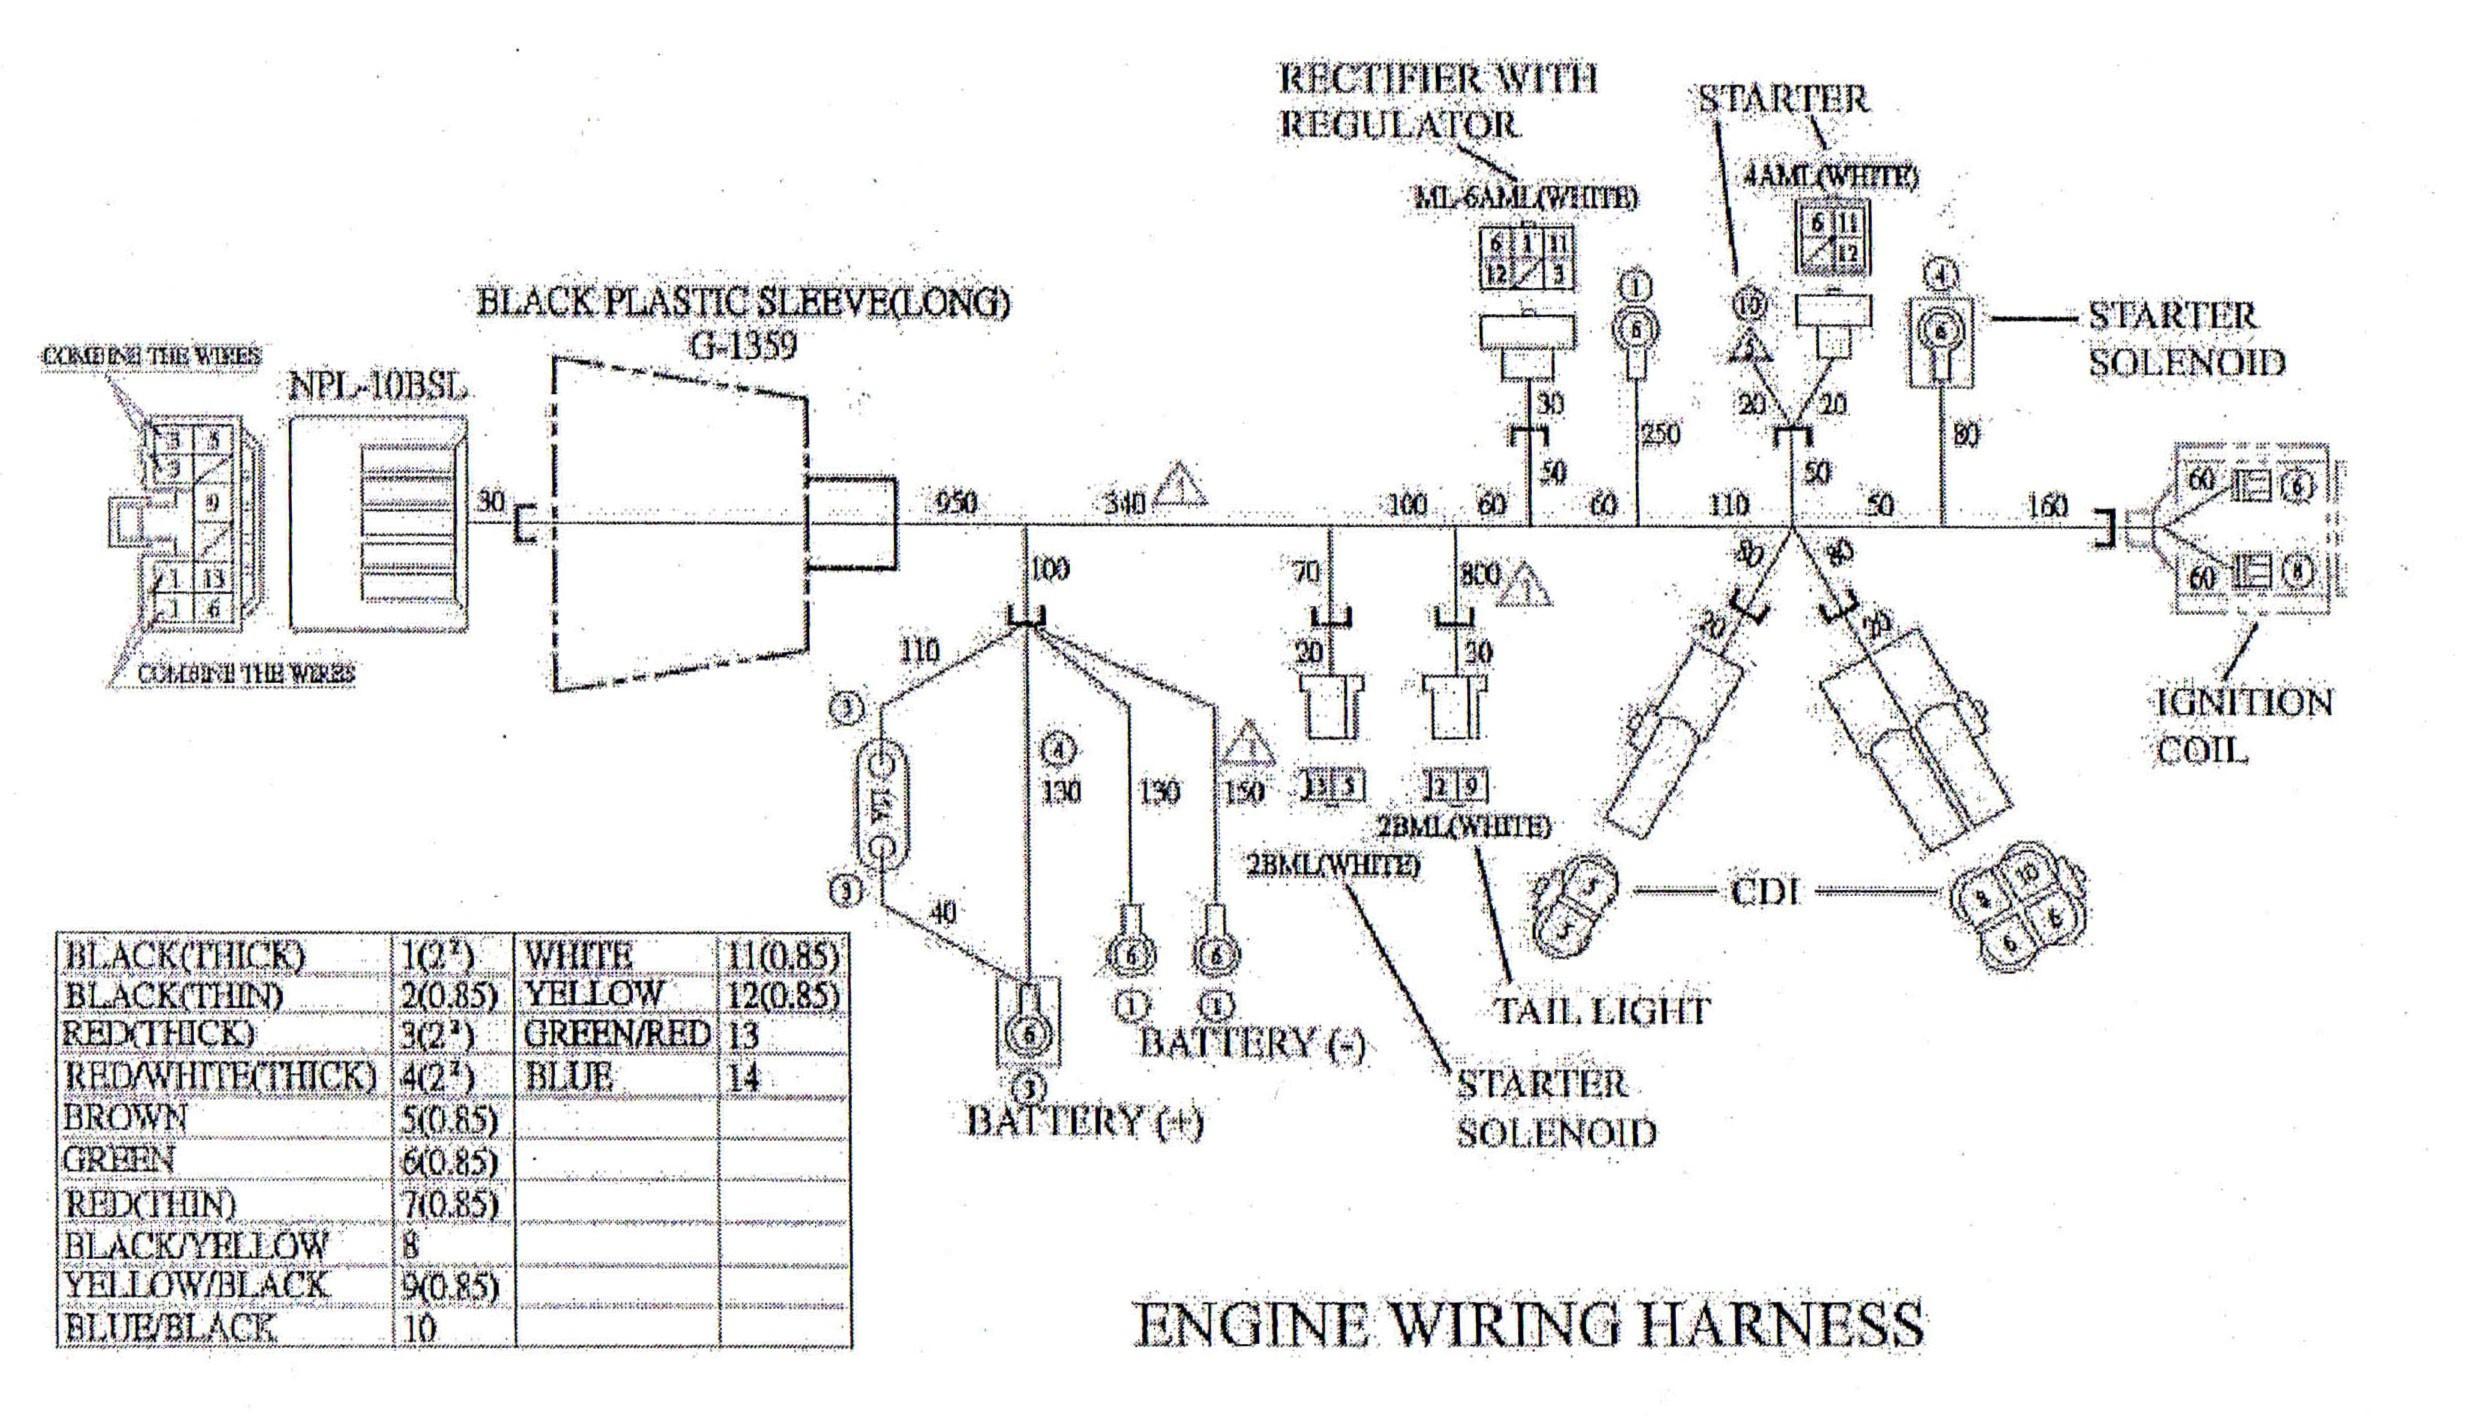 Engine Starter Diagram 1977 Chevy Truck Wiring Circuit Silverado Inspirational Basic Diagrams Of